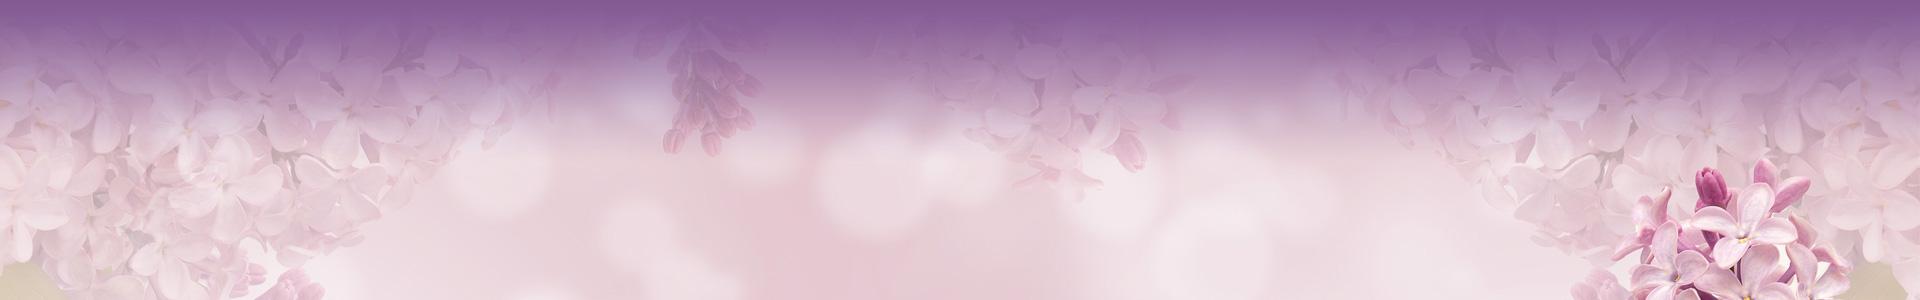 Hochzeitsanzug TW0001SU - Anzug Bräutigam grau gestreift 100% Wolle